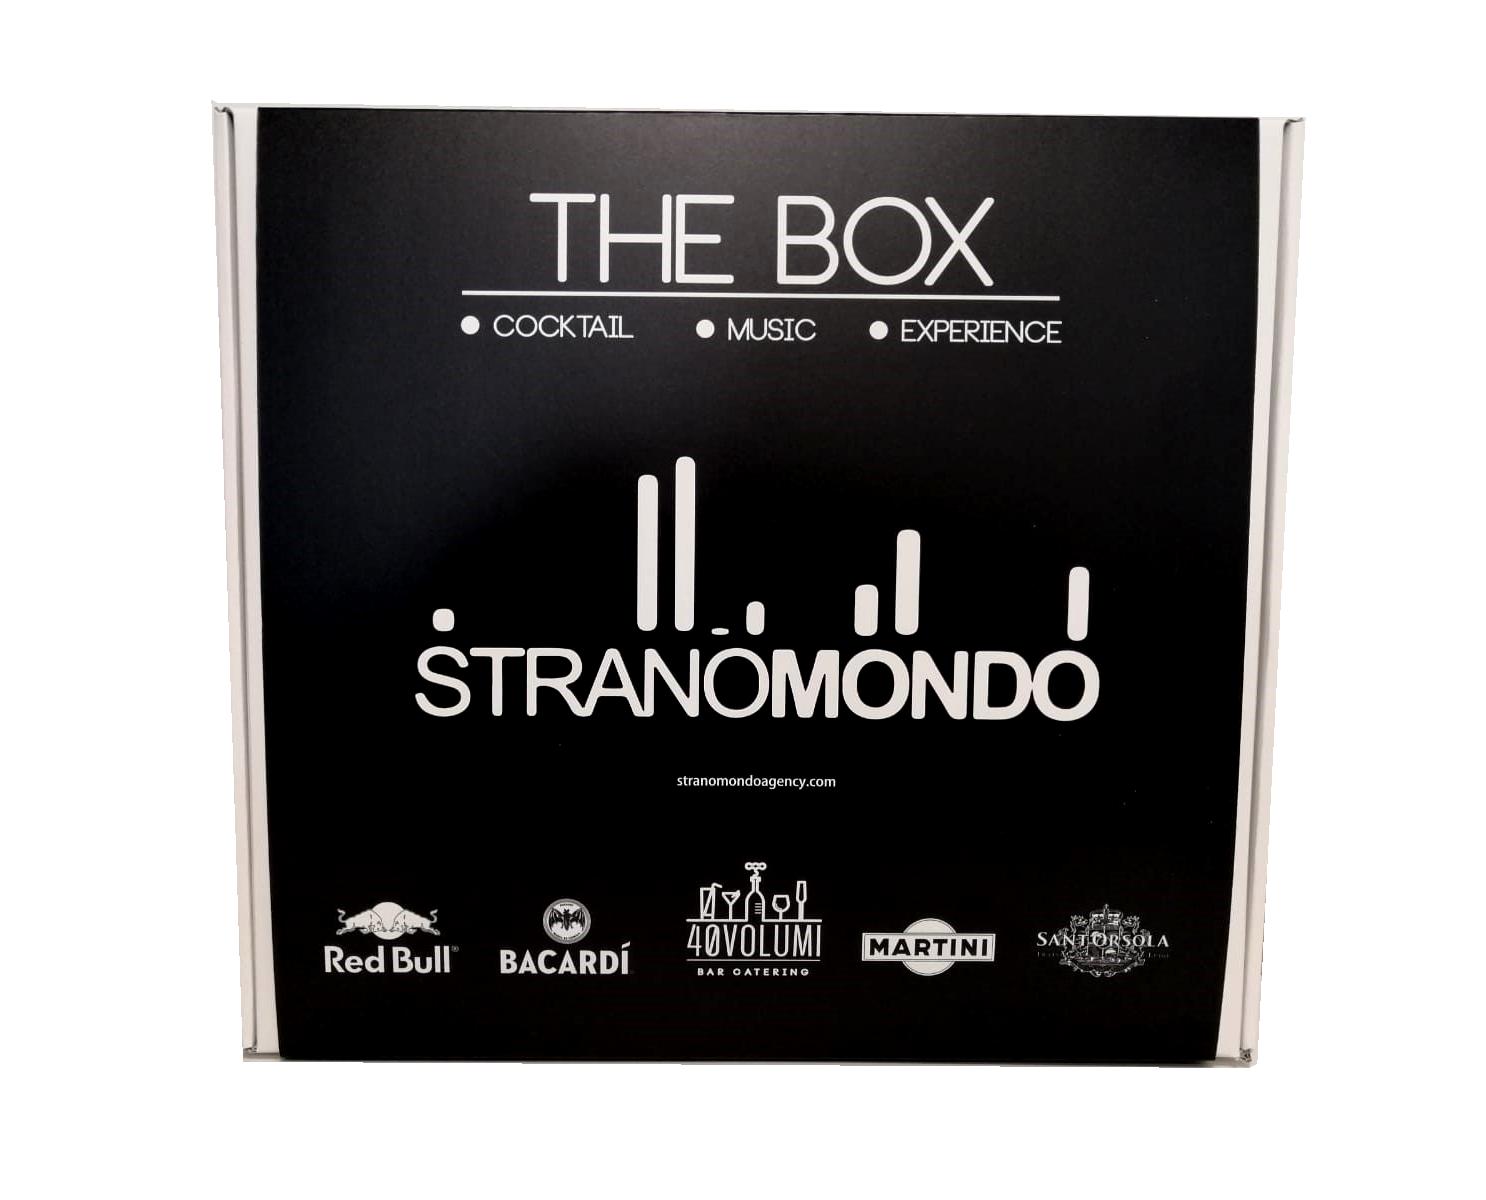 Stranomondo